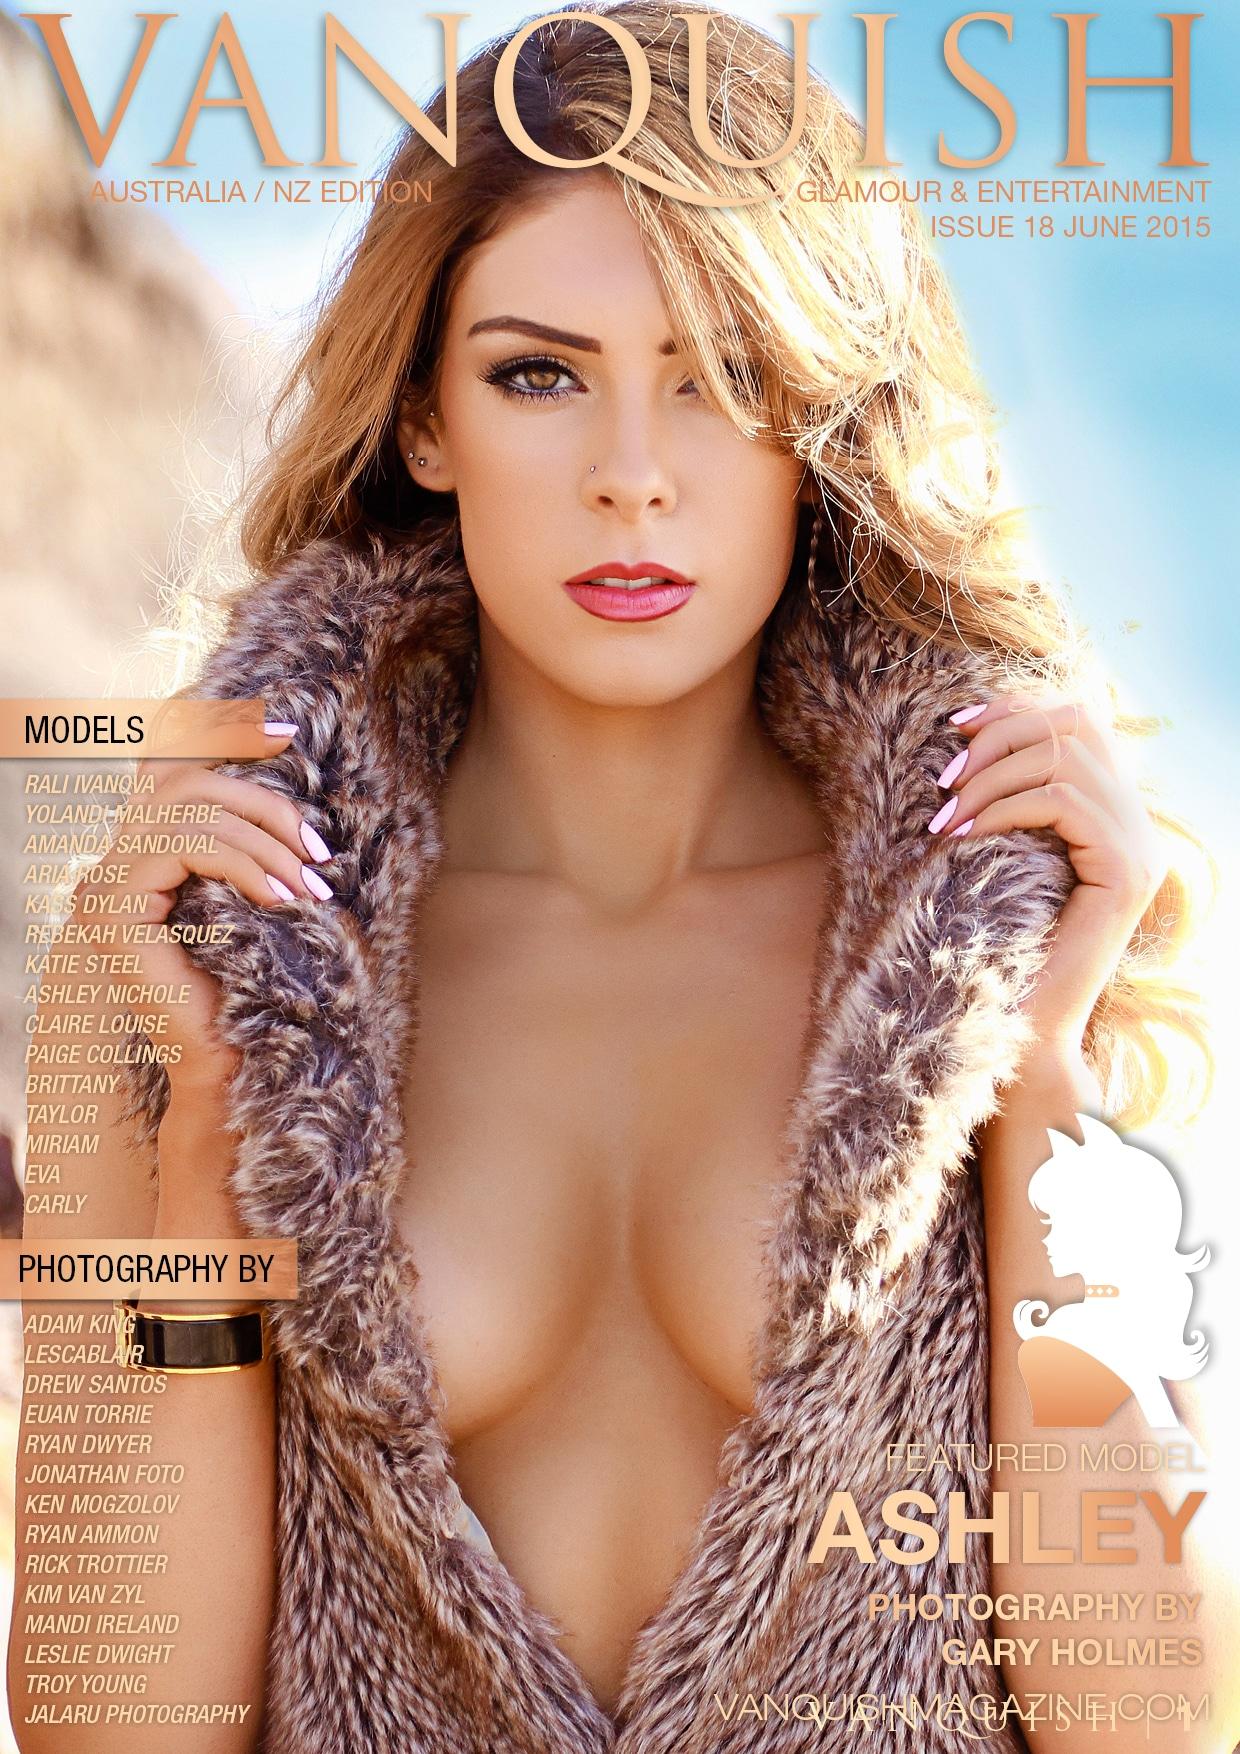 Vanquish Magazine Anz – June 2015 – Ashley